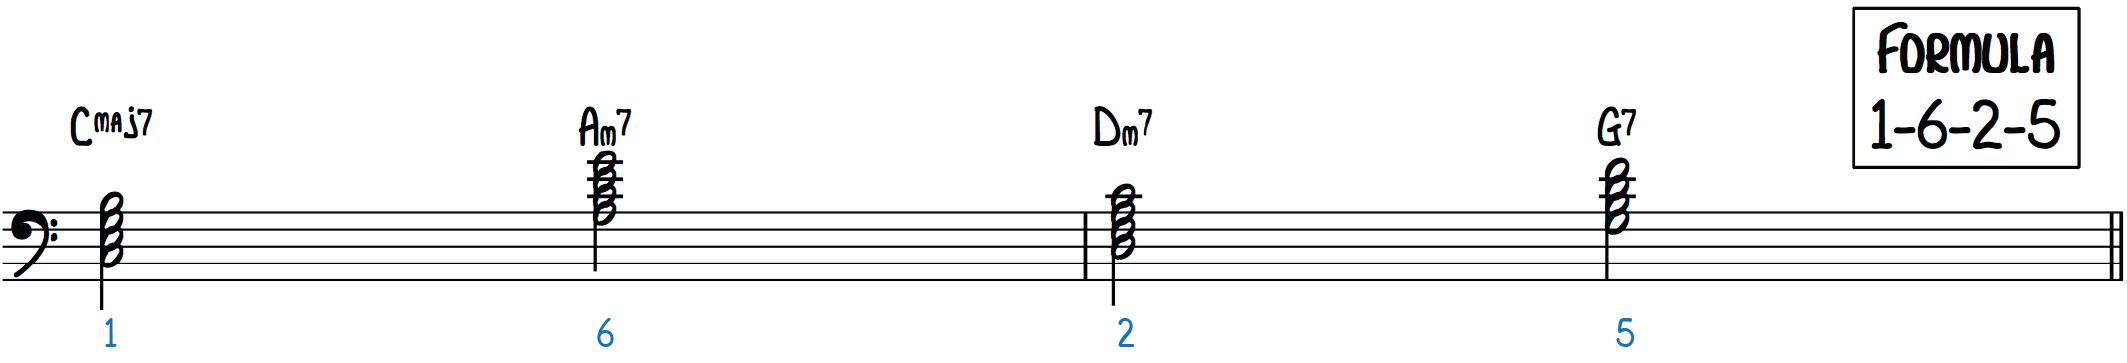 The Turnaround Chord Progression jazz piano improv 1-6-2-5 intro ending vamp memorize jazz songs